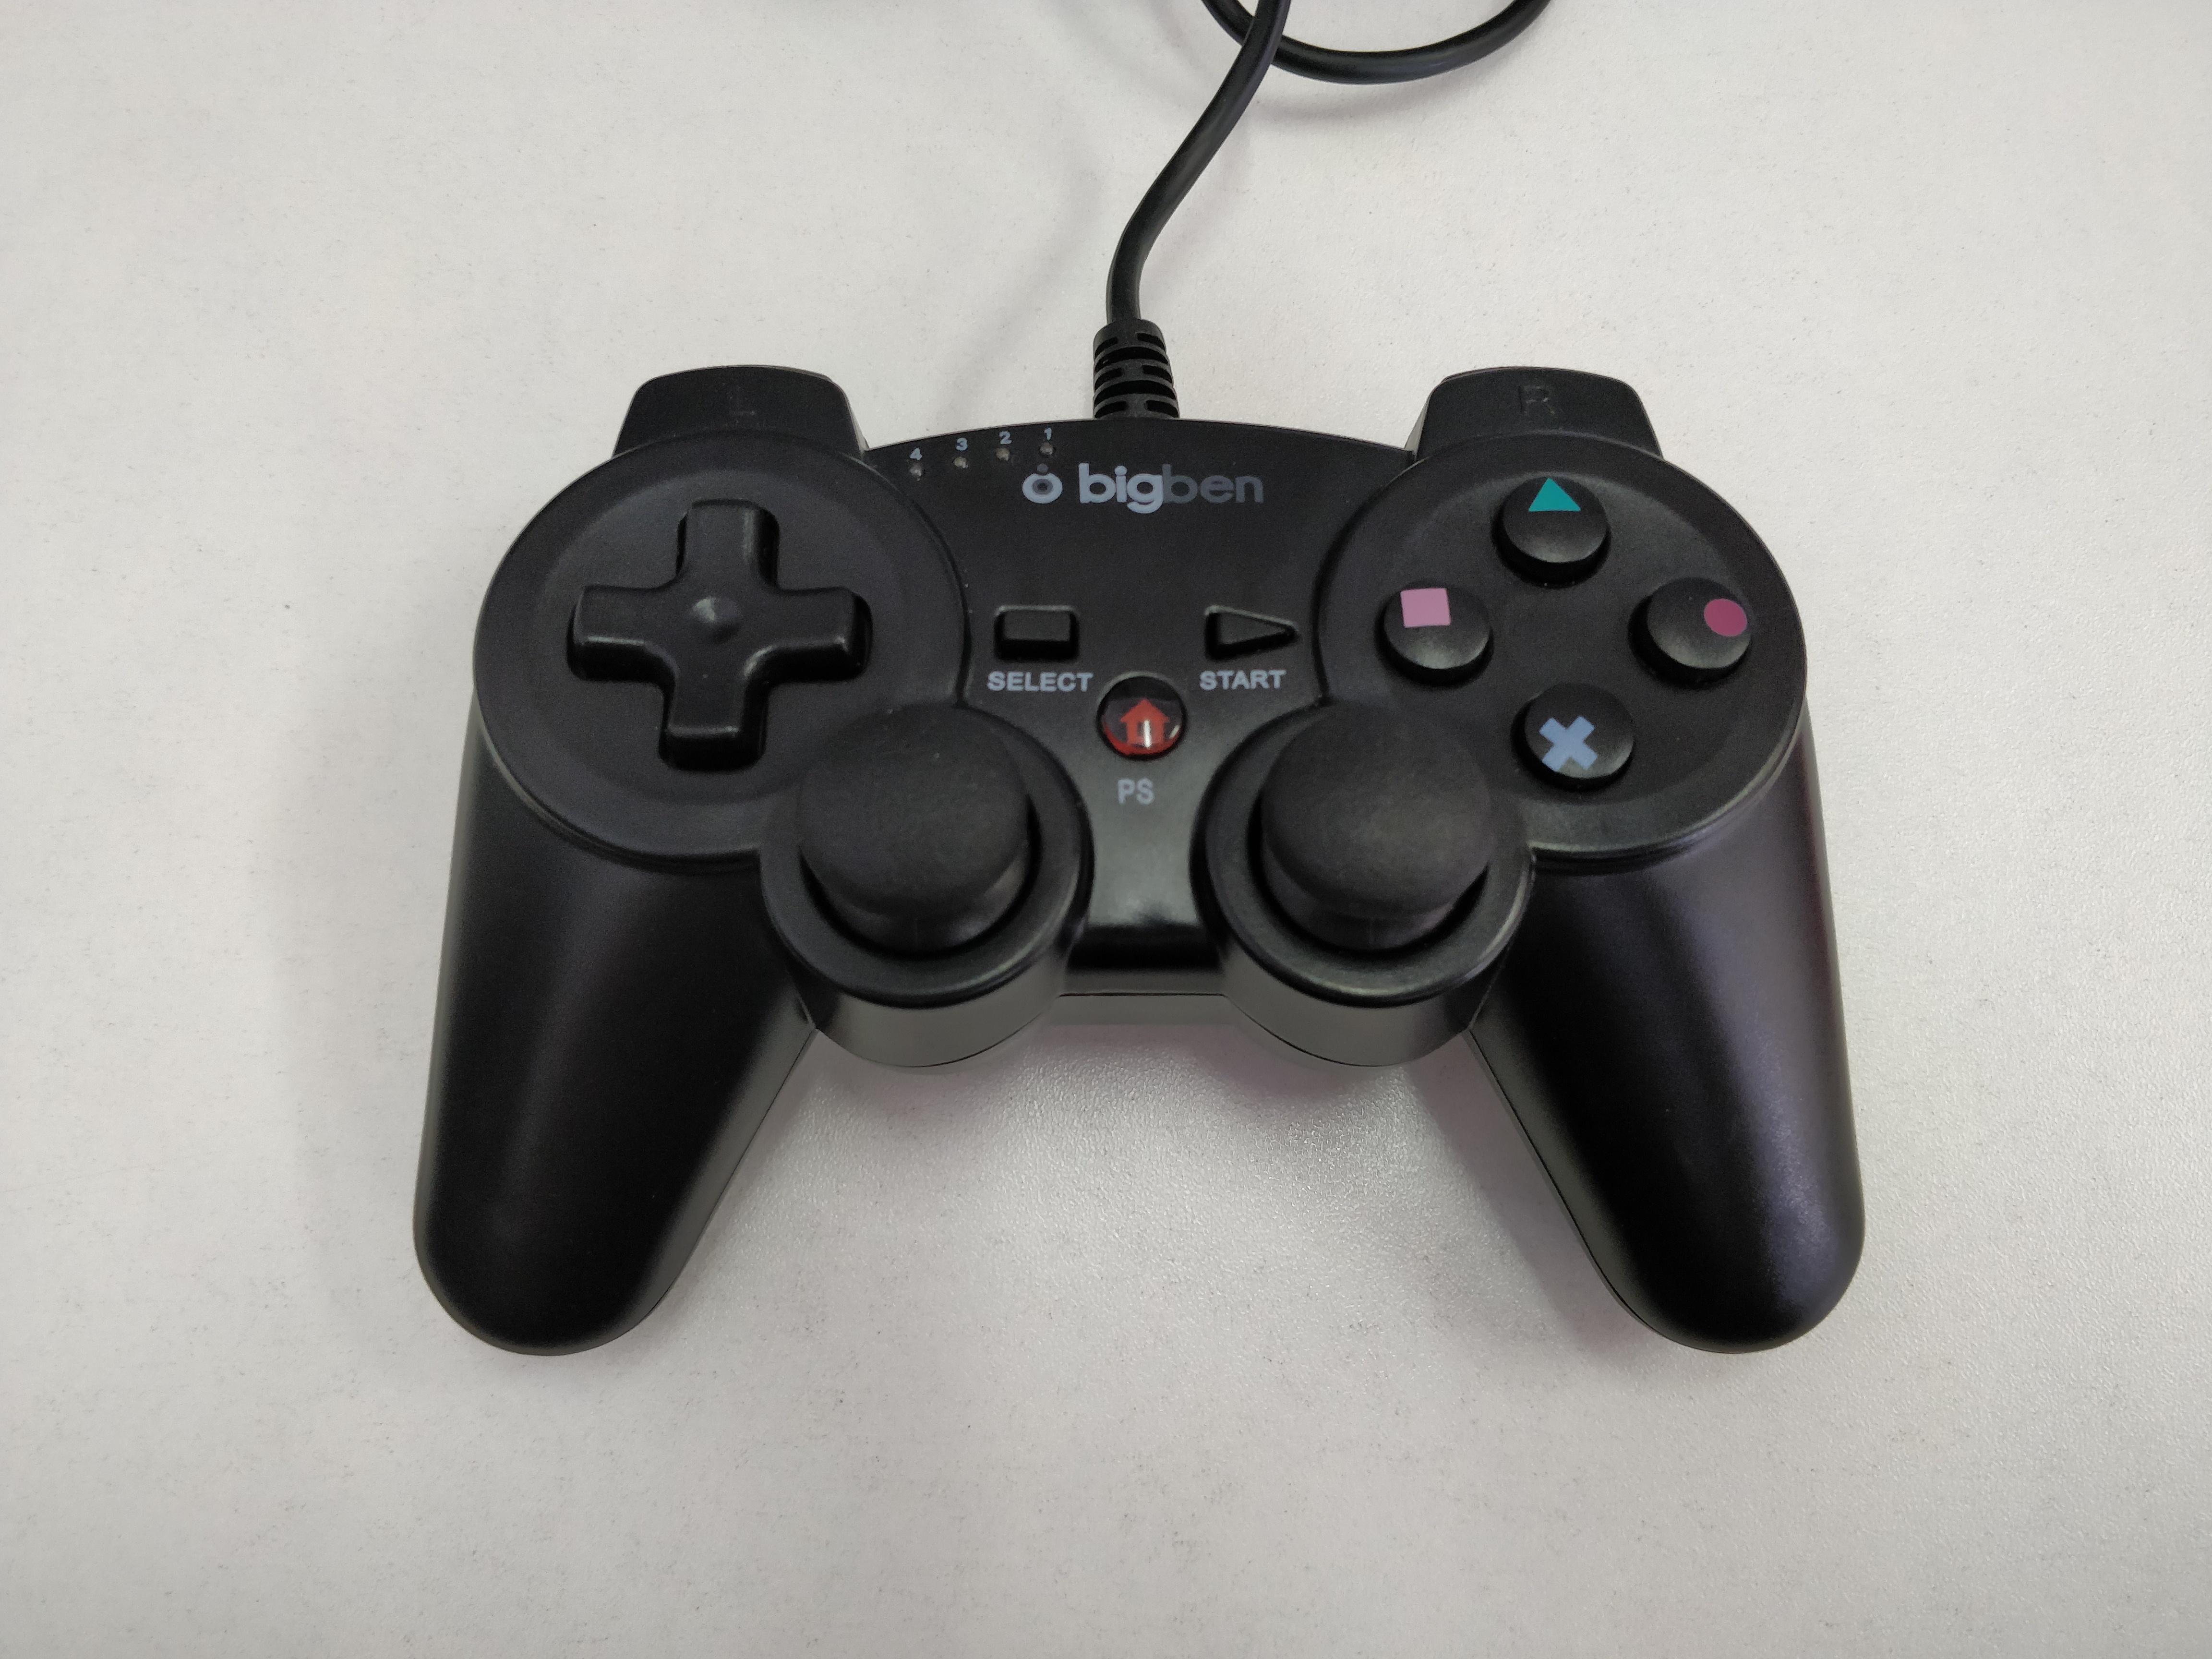 [PS3] Drátový Ovladač Bigben - černý (estetická vada)